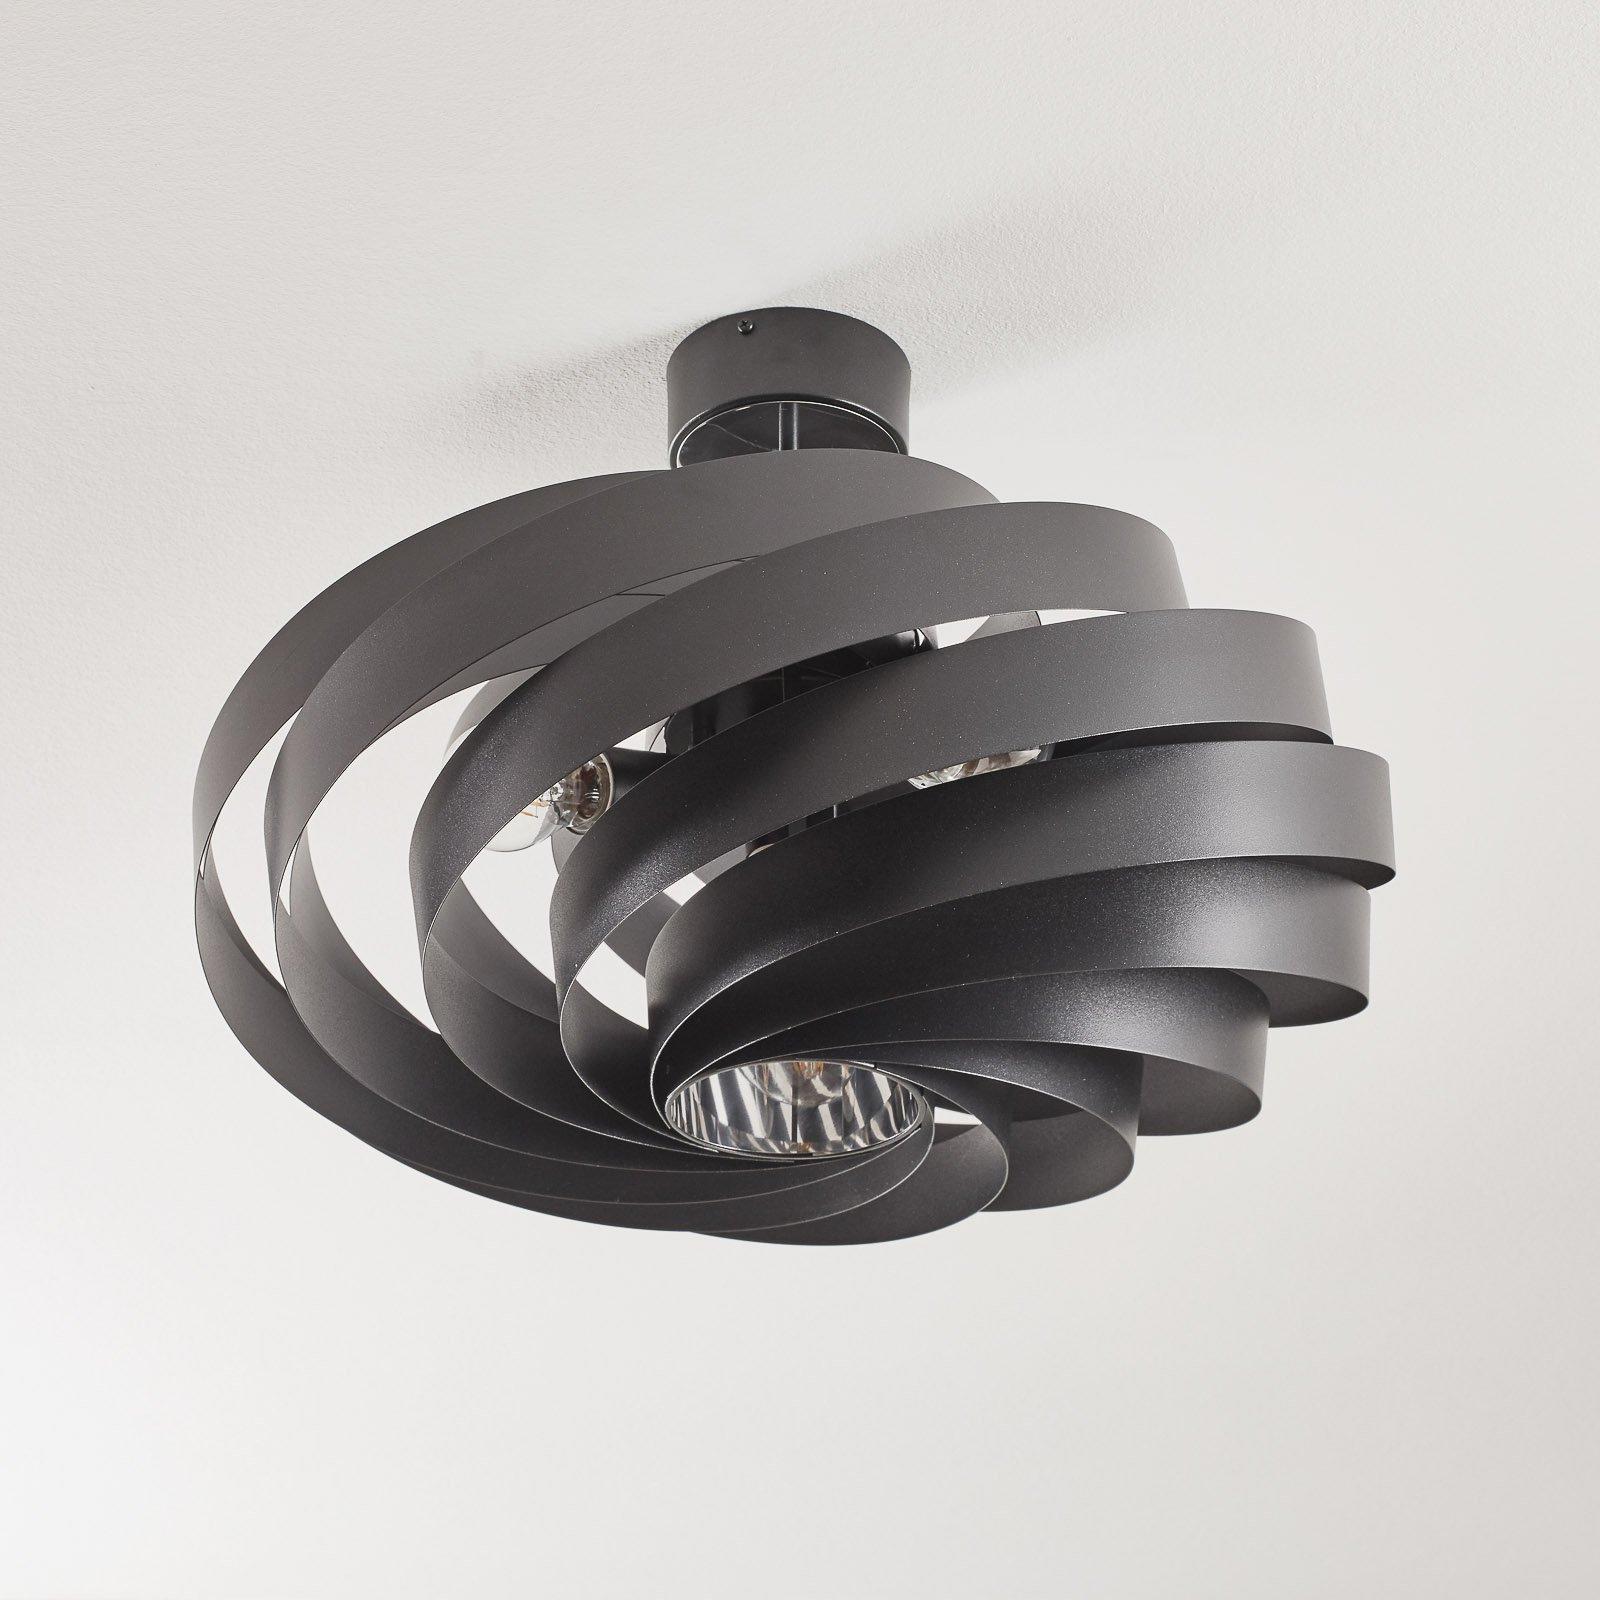 Taklampe Vento svart Ø 60 cm